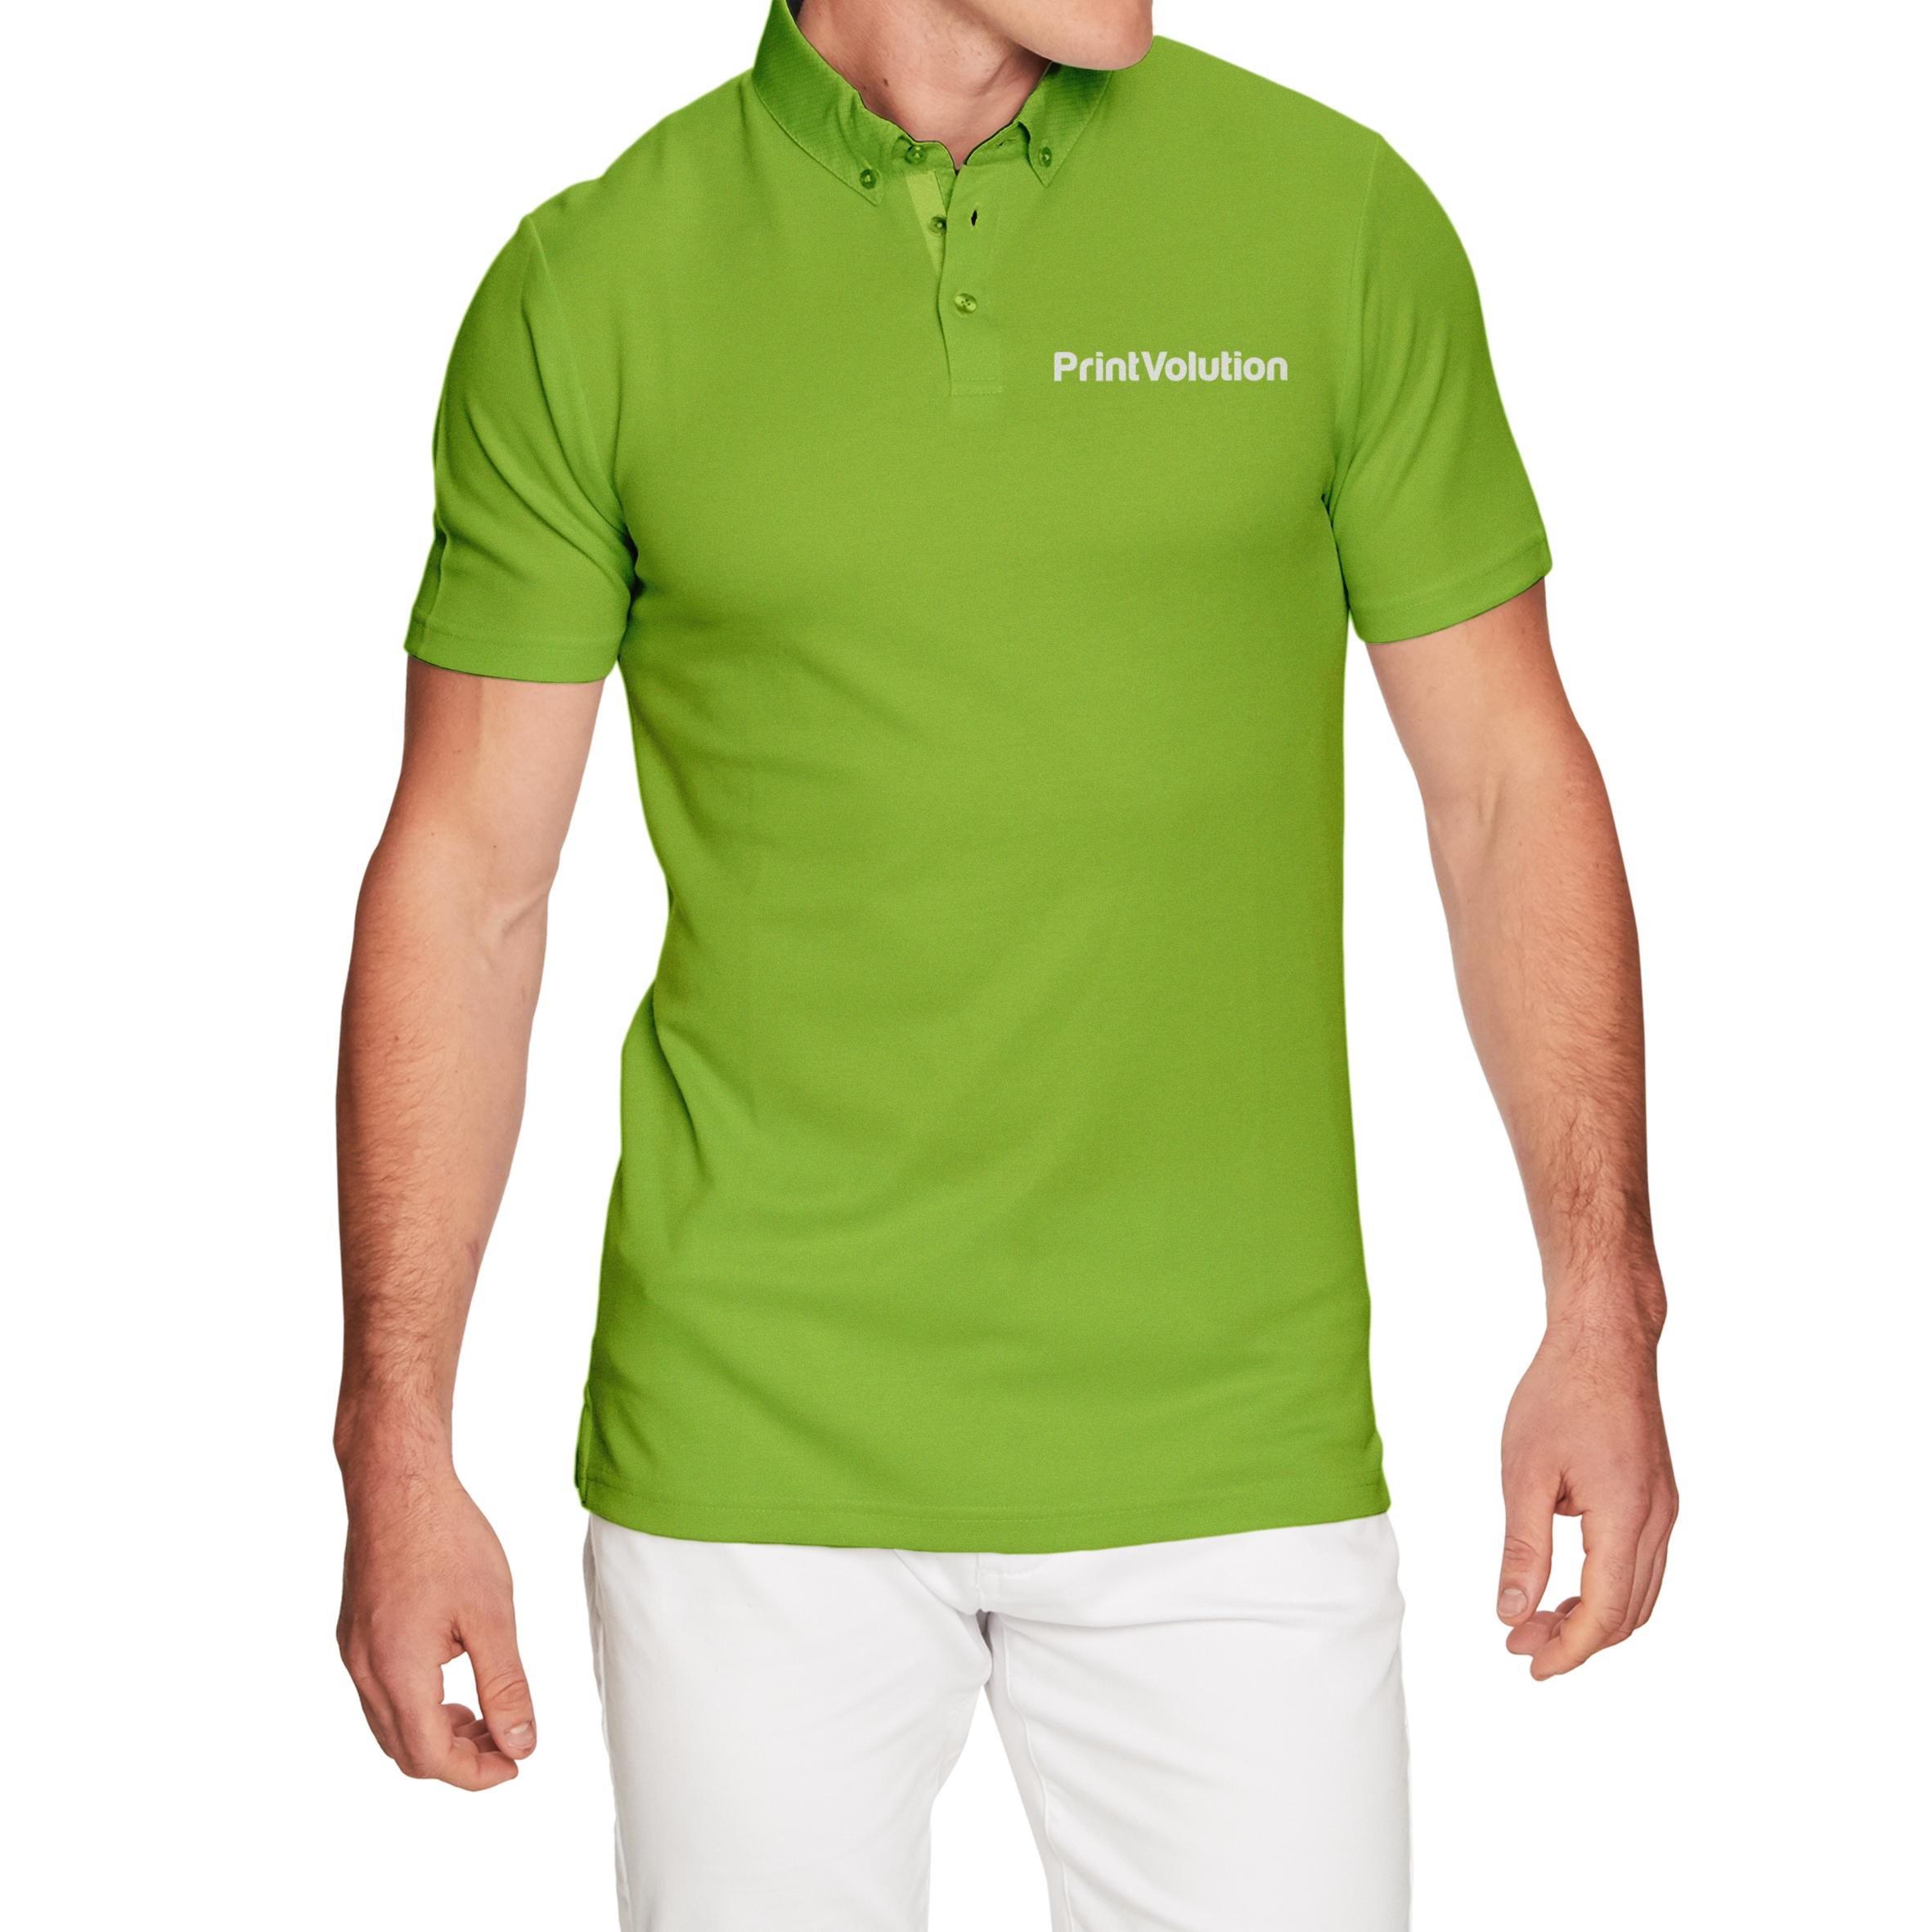 UDF0518 – Lime Green